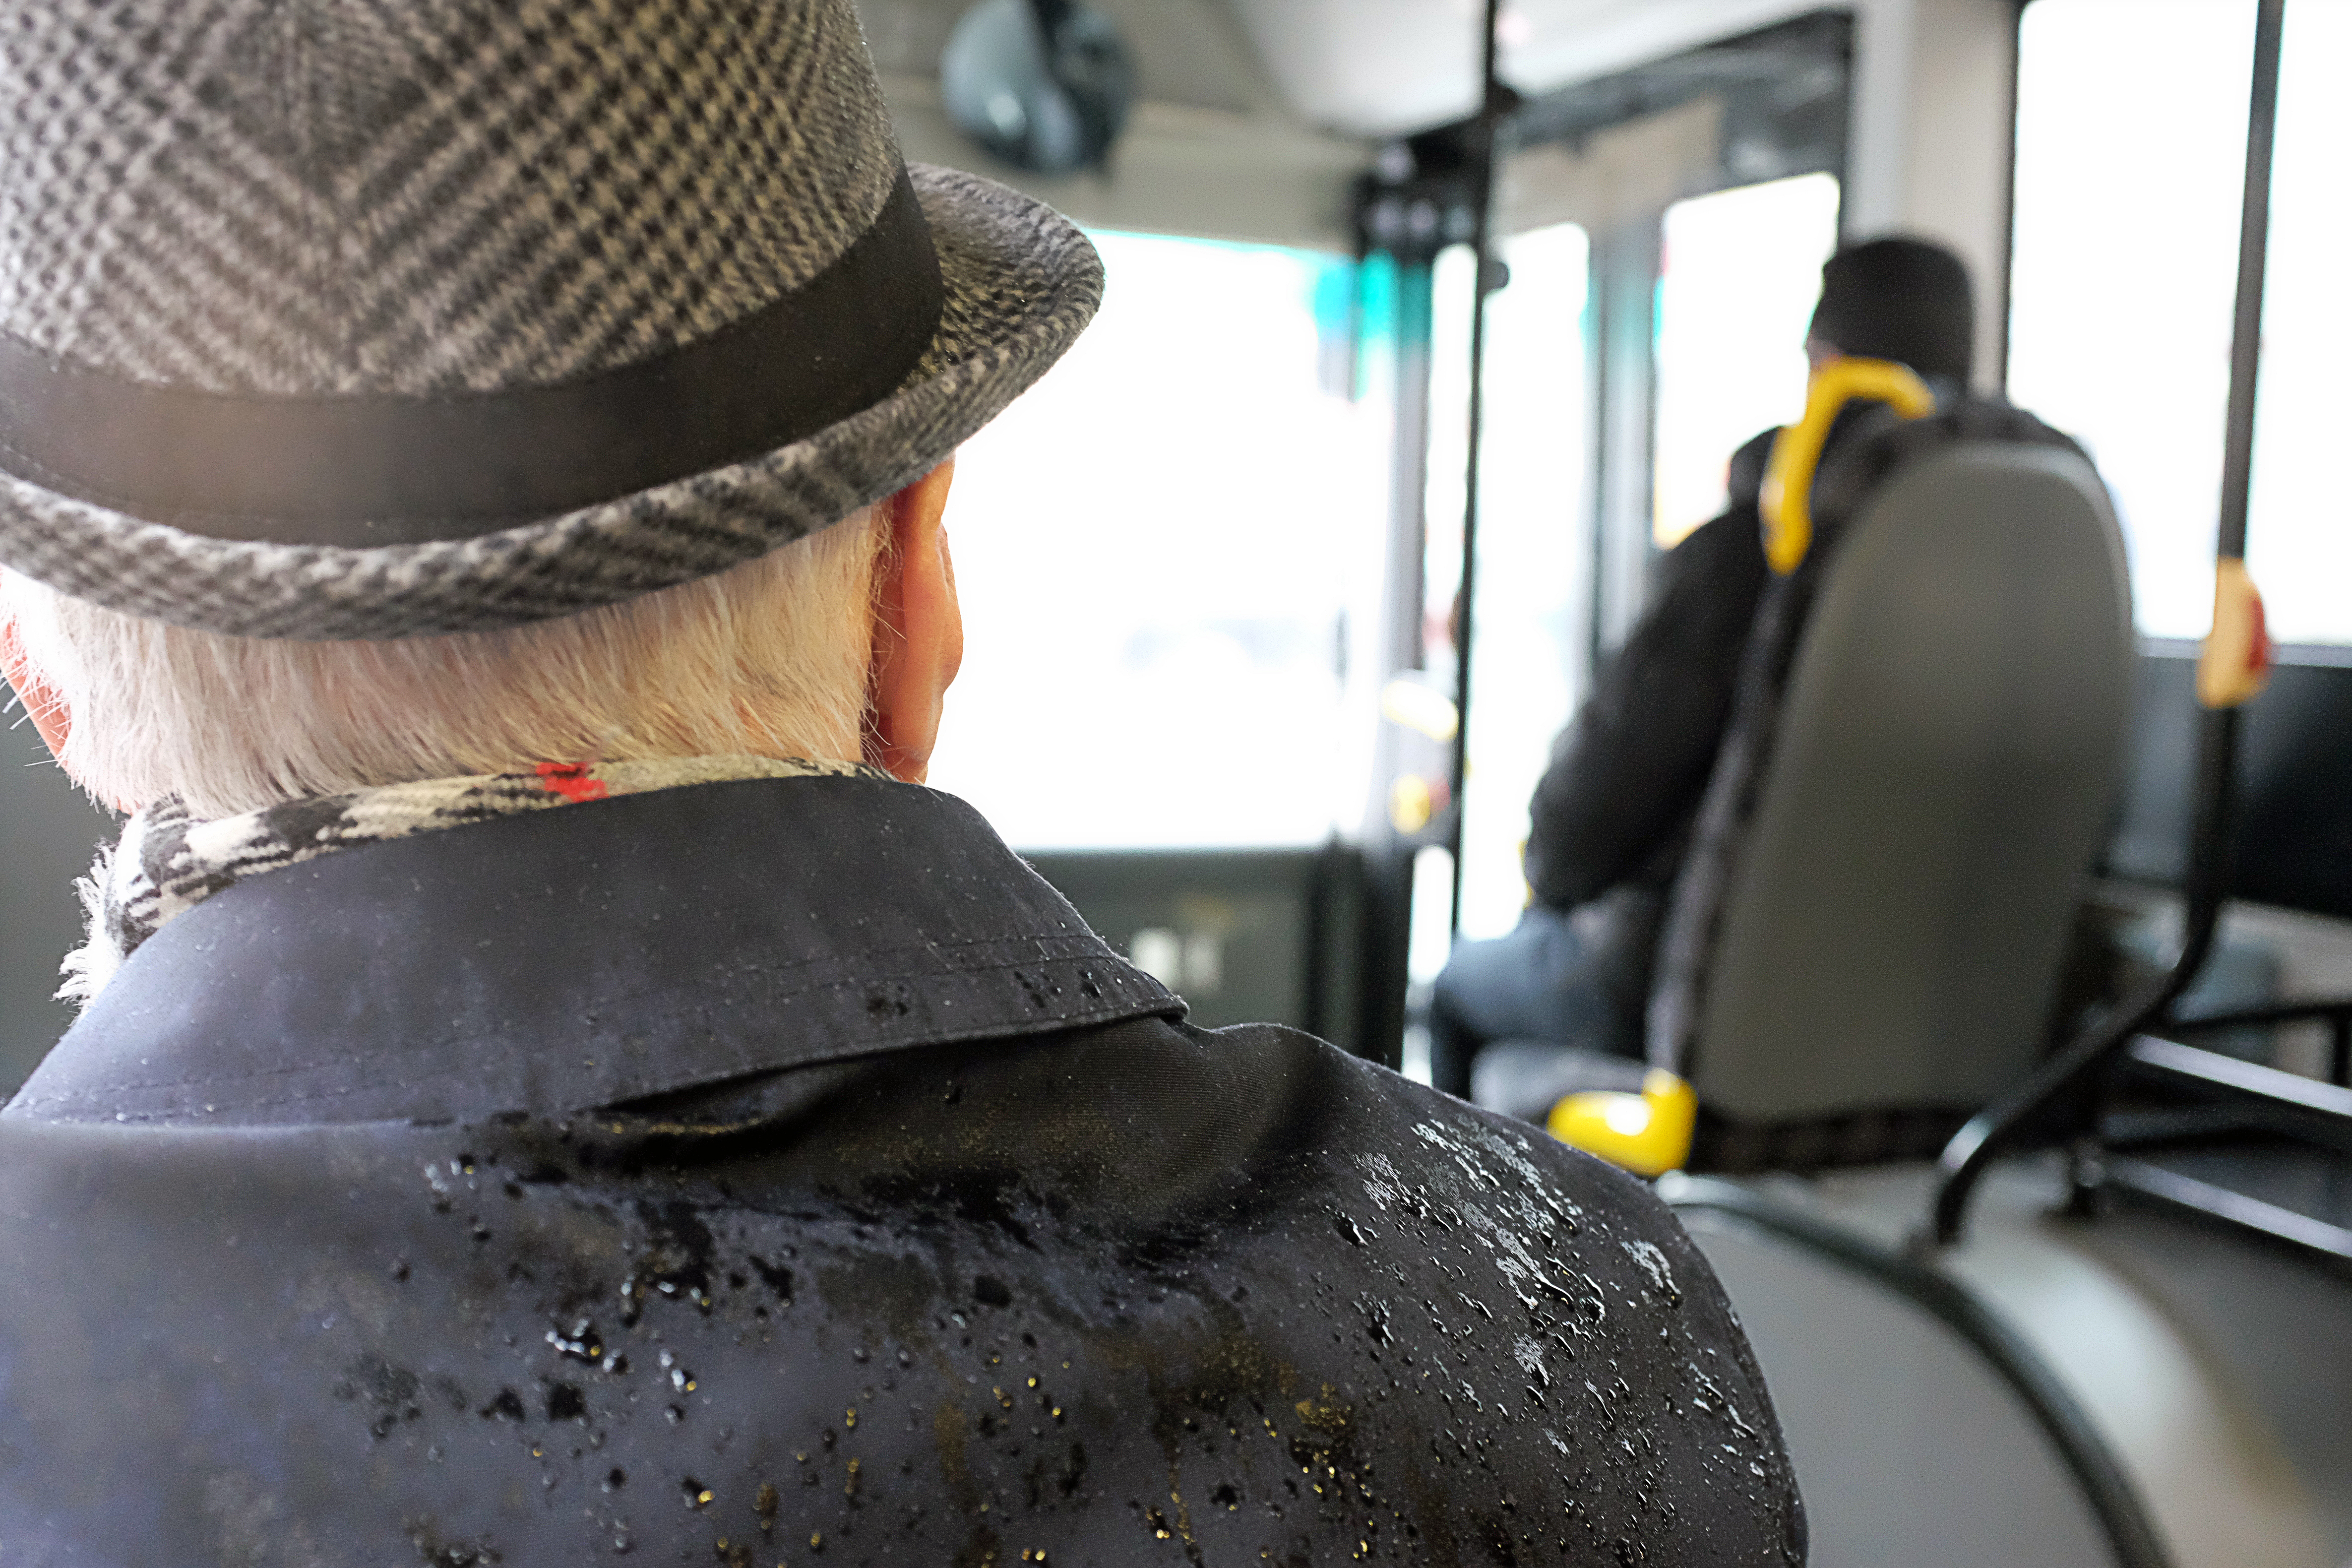 Daugavpils gives pensioners free public transport (Latvia)